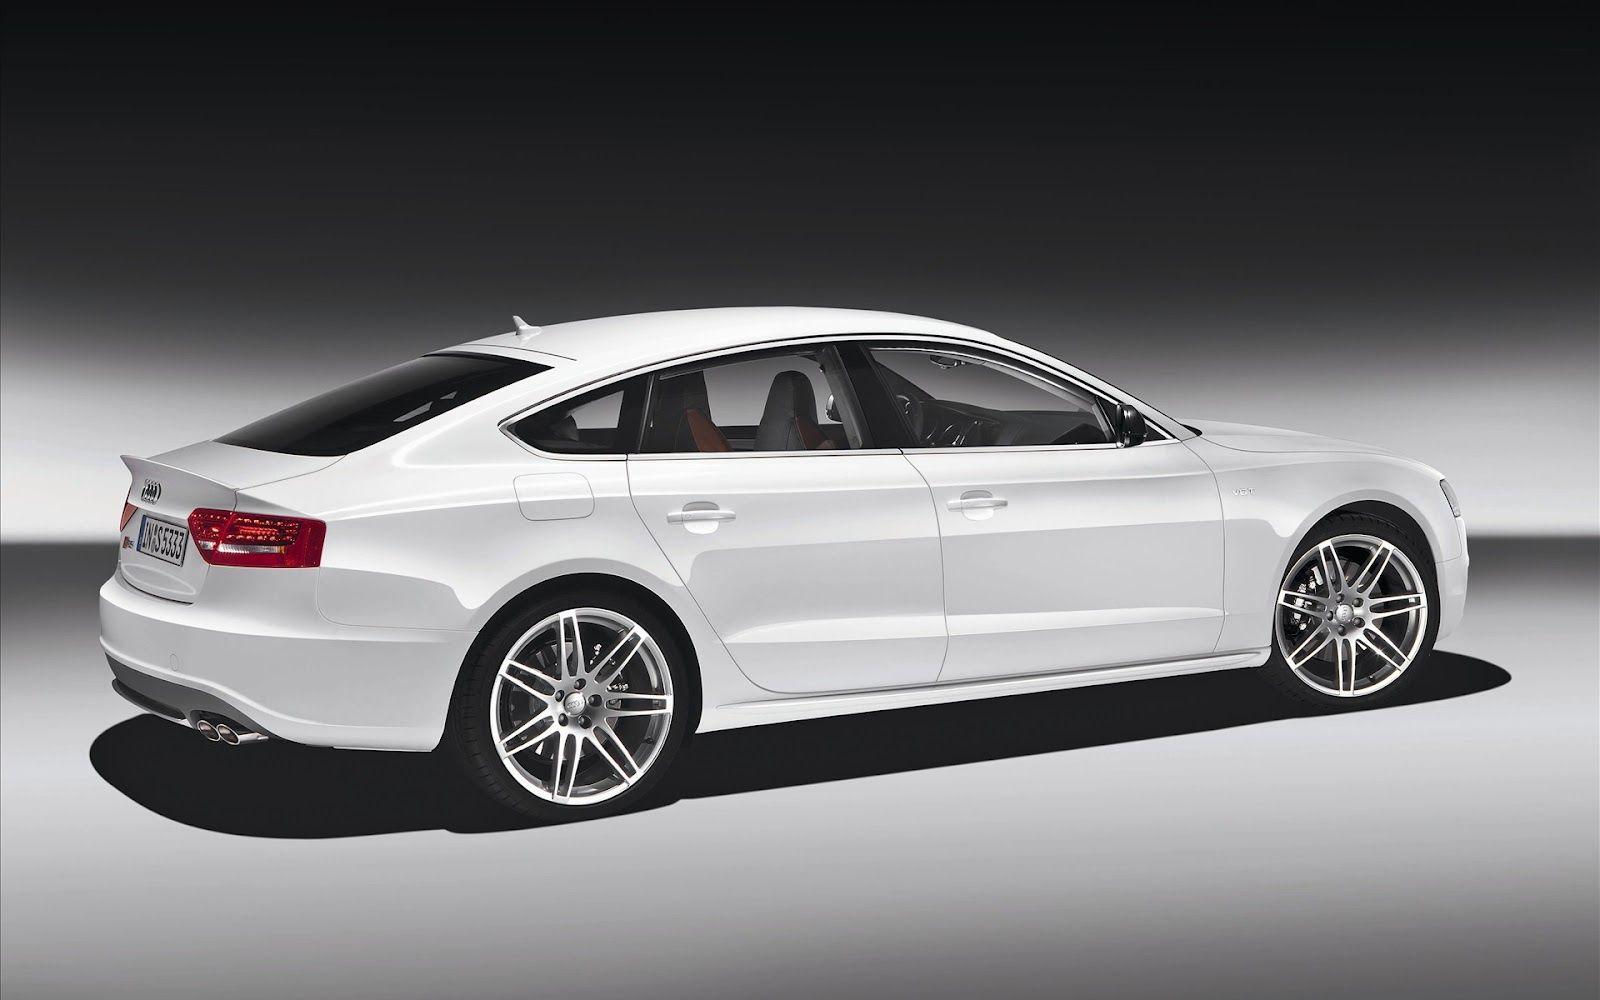 Download Car Desktop Wallpaper Cars Pinterest Audi Cars - Audi car types